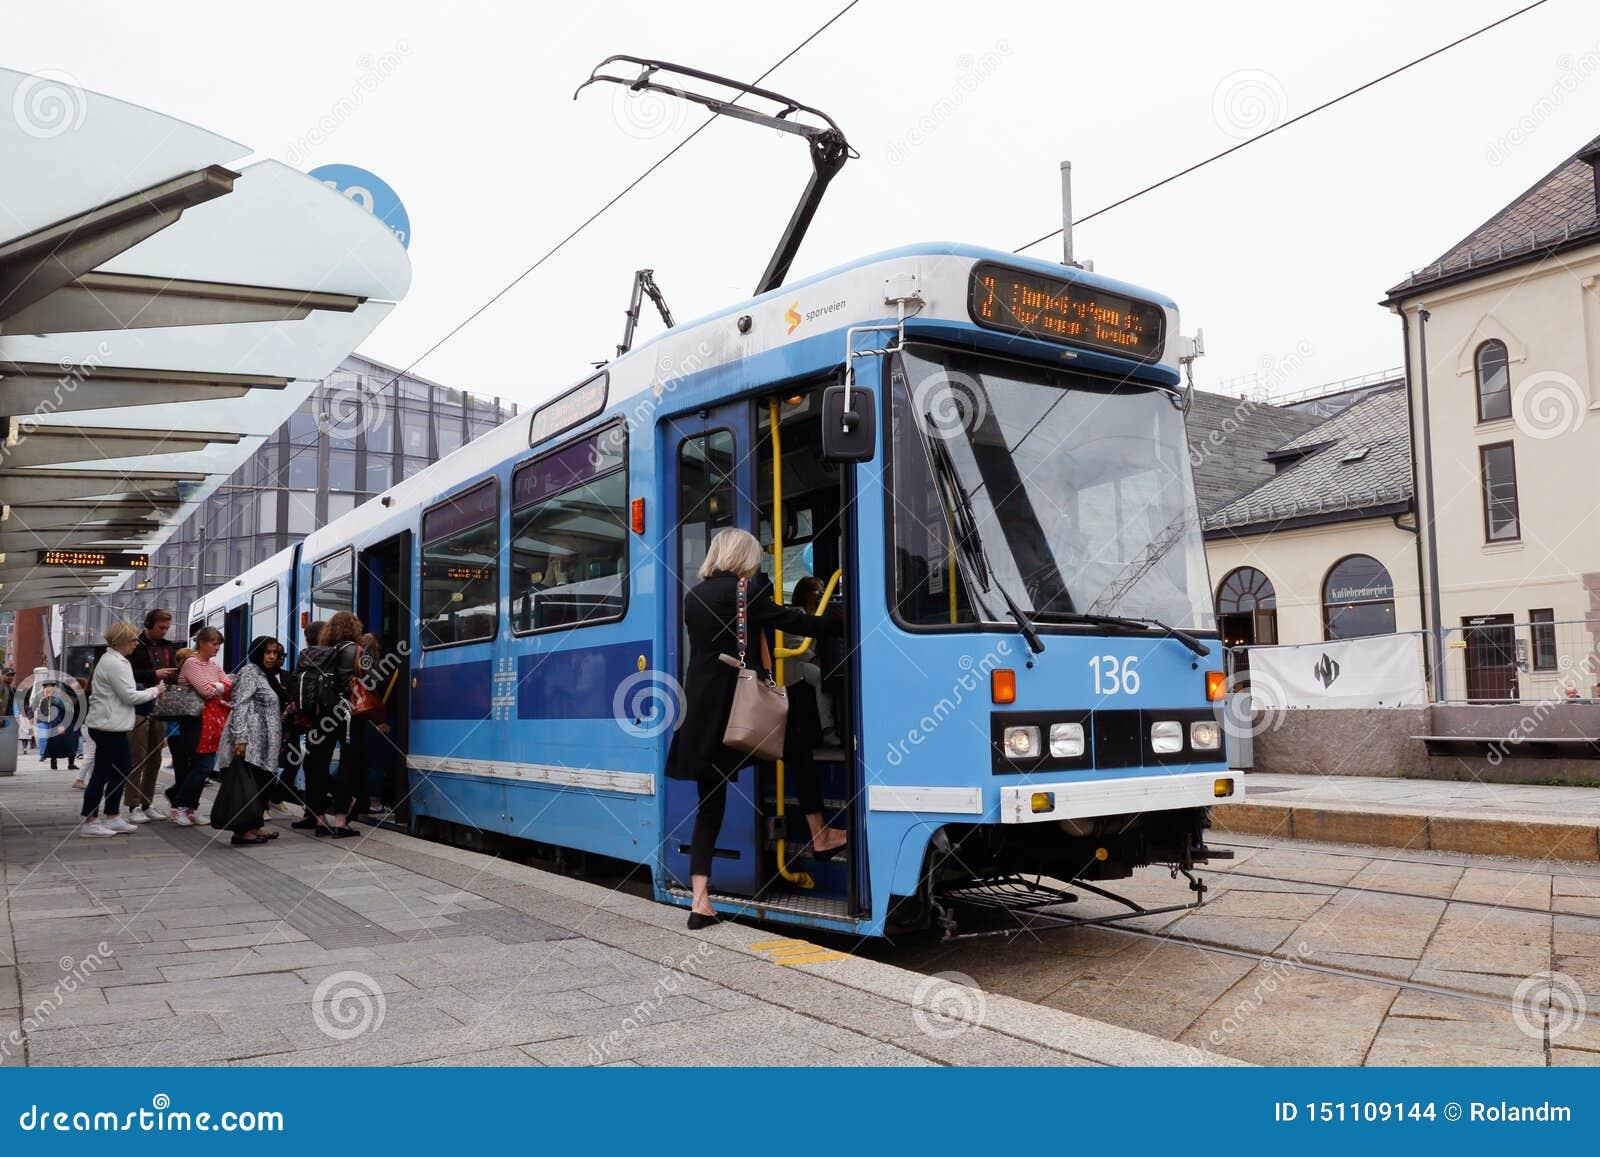 Oslo tram class SL79